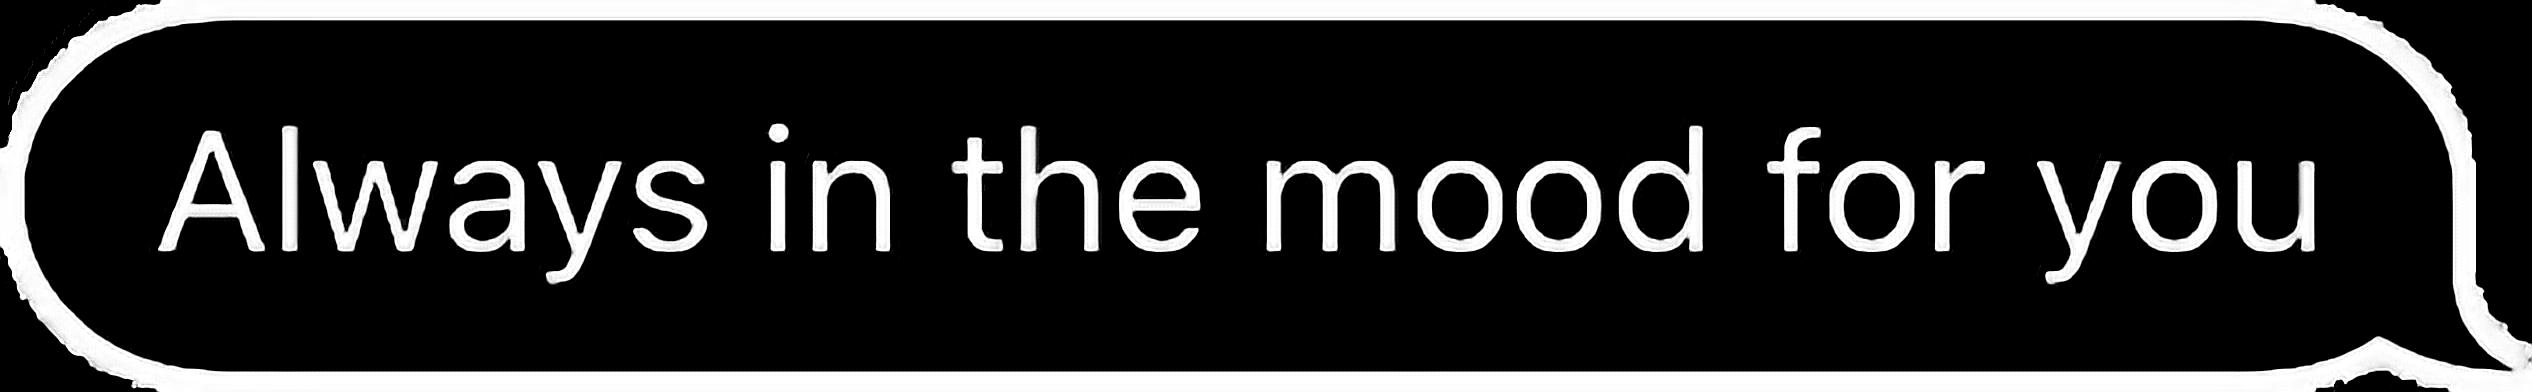 #tumblr #text #aesthetic #black #imessage #alternative #freetoedit